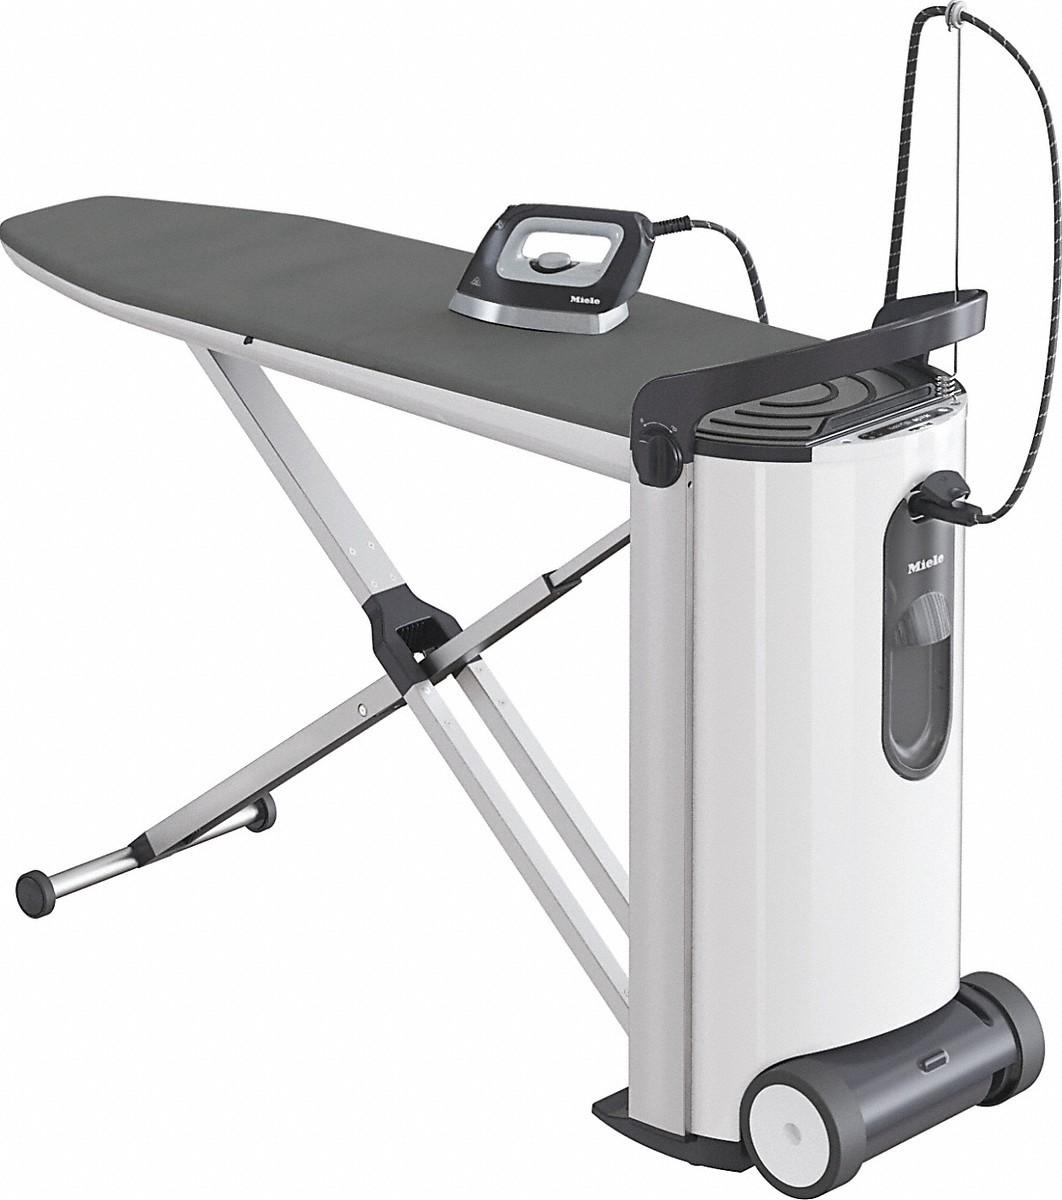 B 3312 FashionMaster  Steam ironing system 熨斗